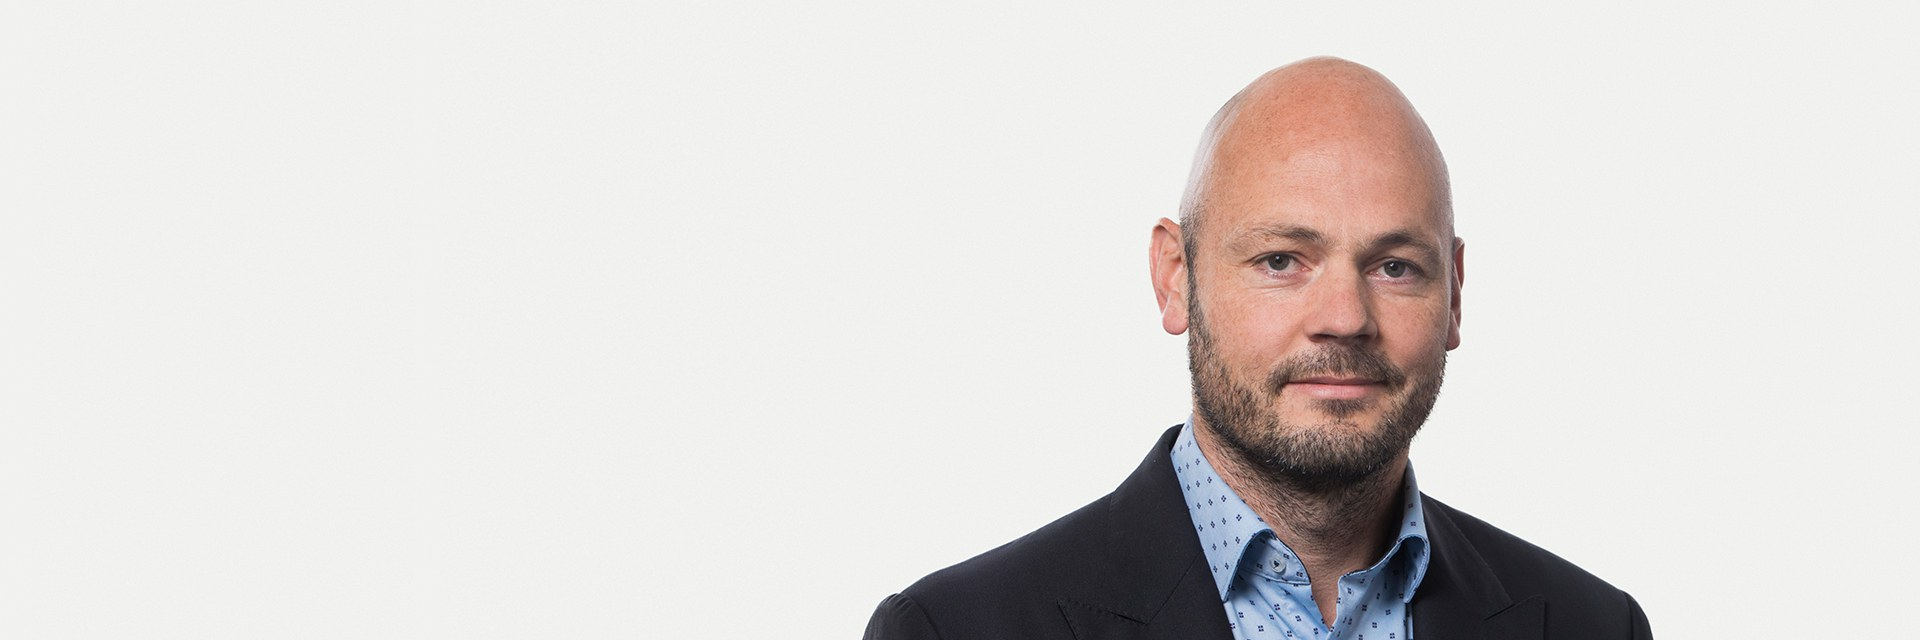 Prof. Dr.-Ing. Harald Schuler